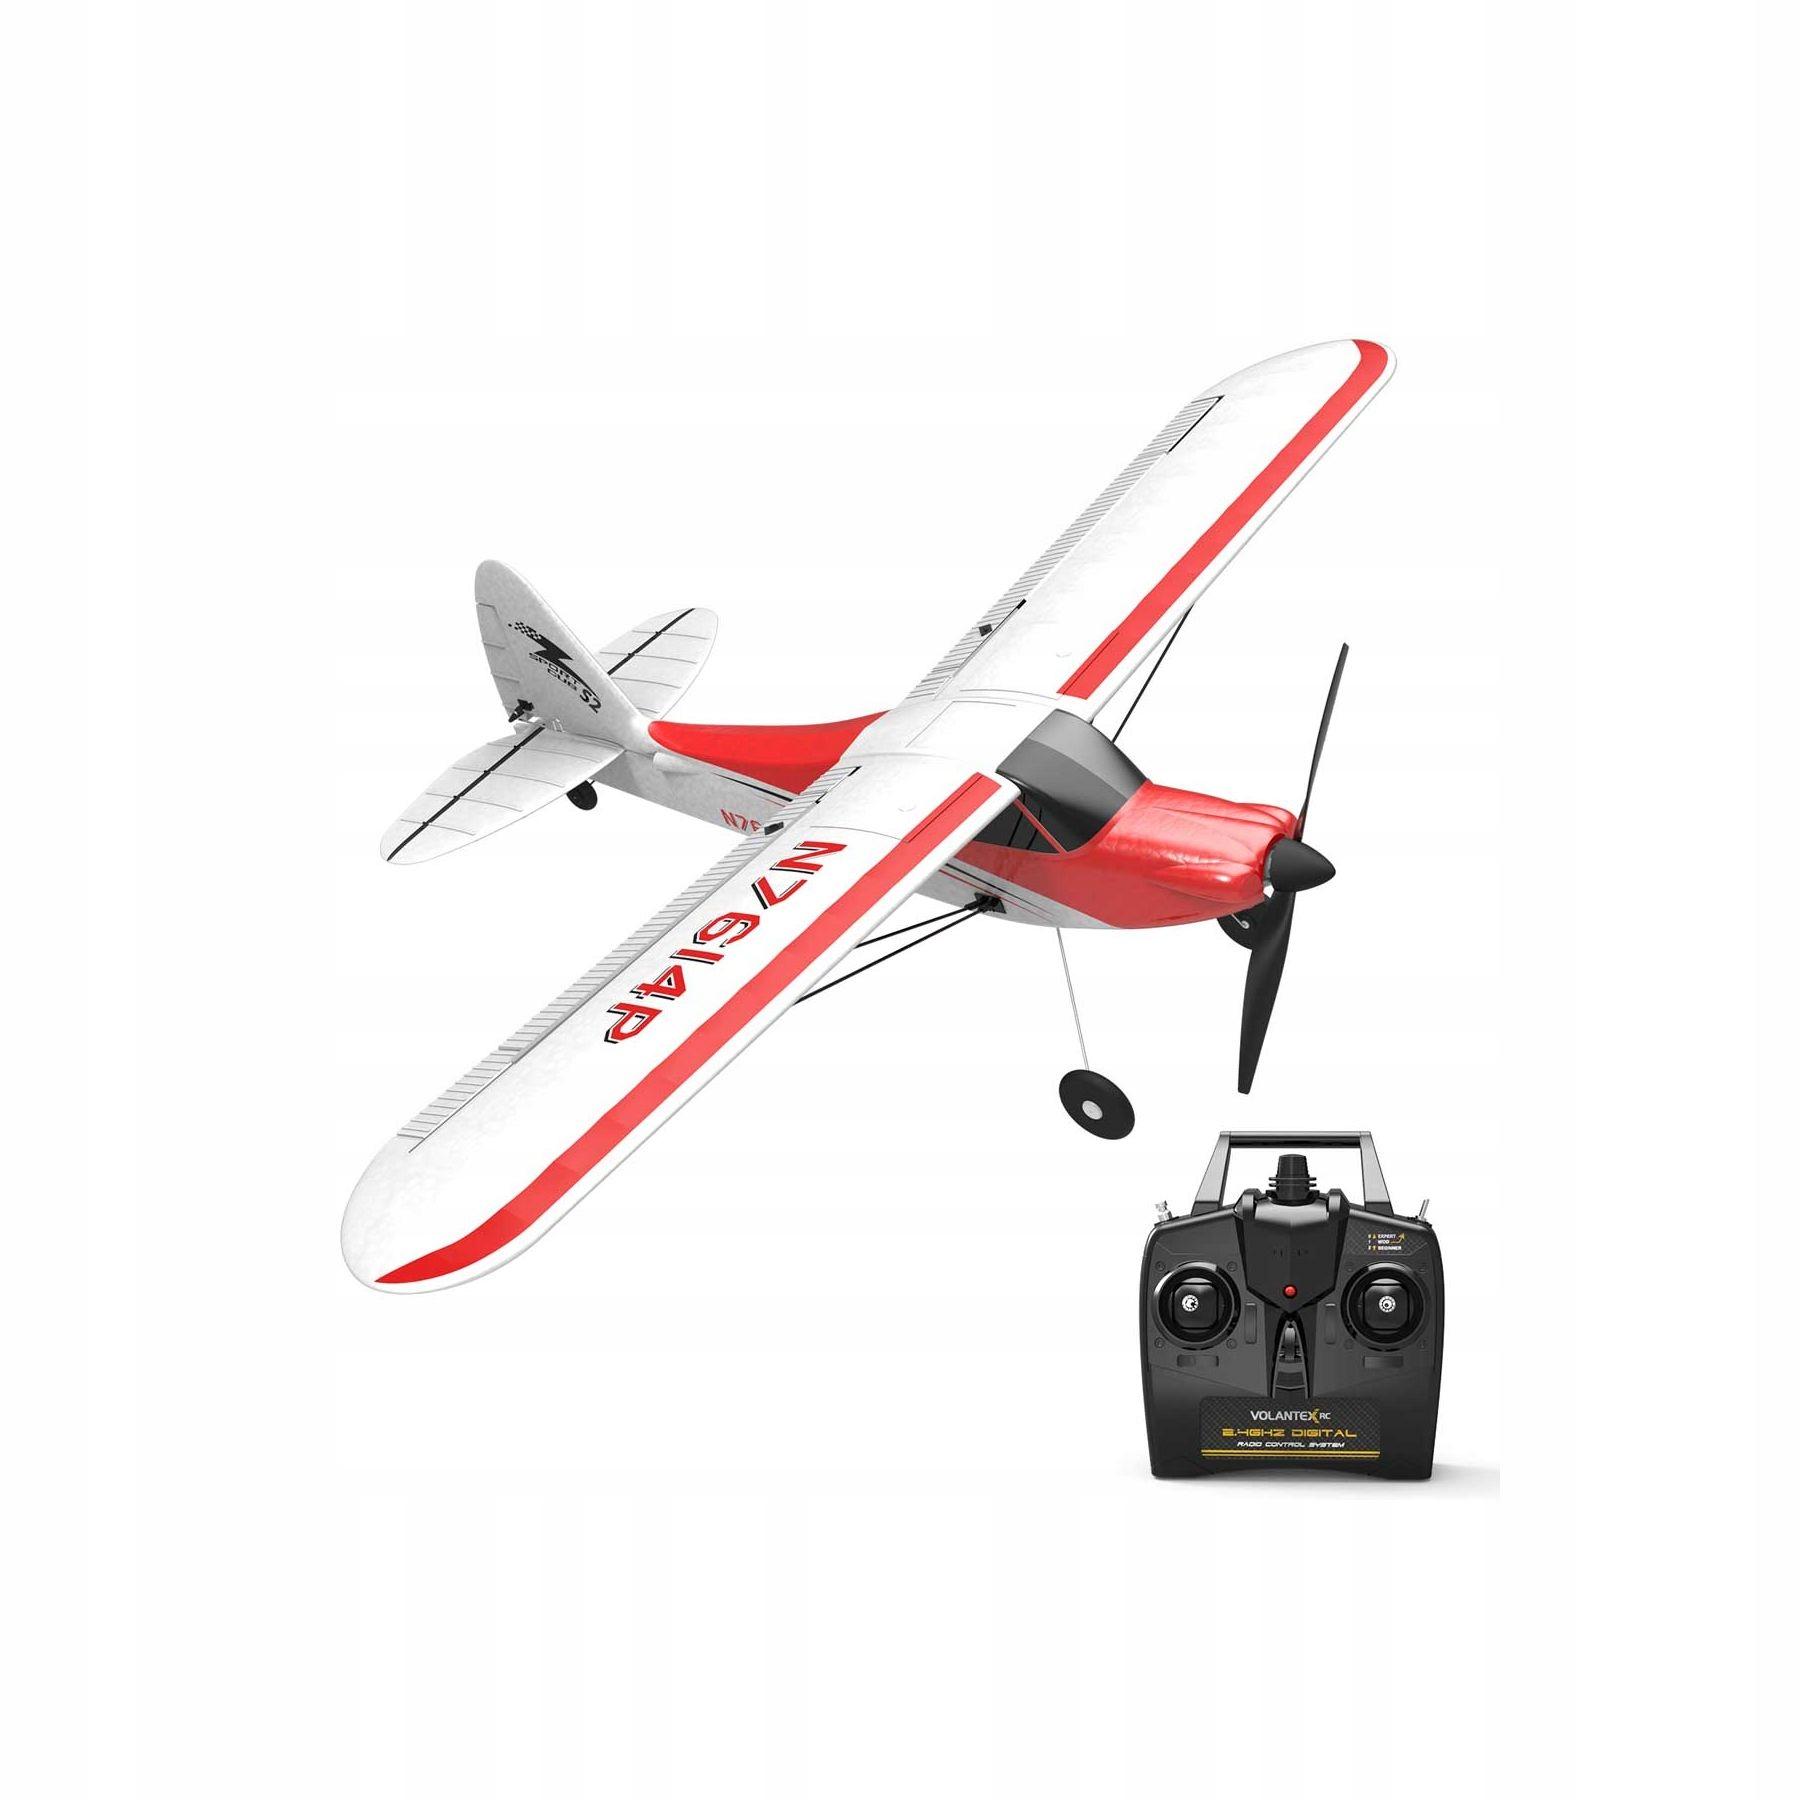 Volantex Sport Cub 500 Samolot 761-4 RTF żyroskop